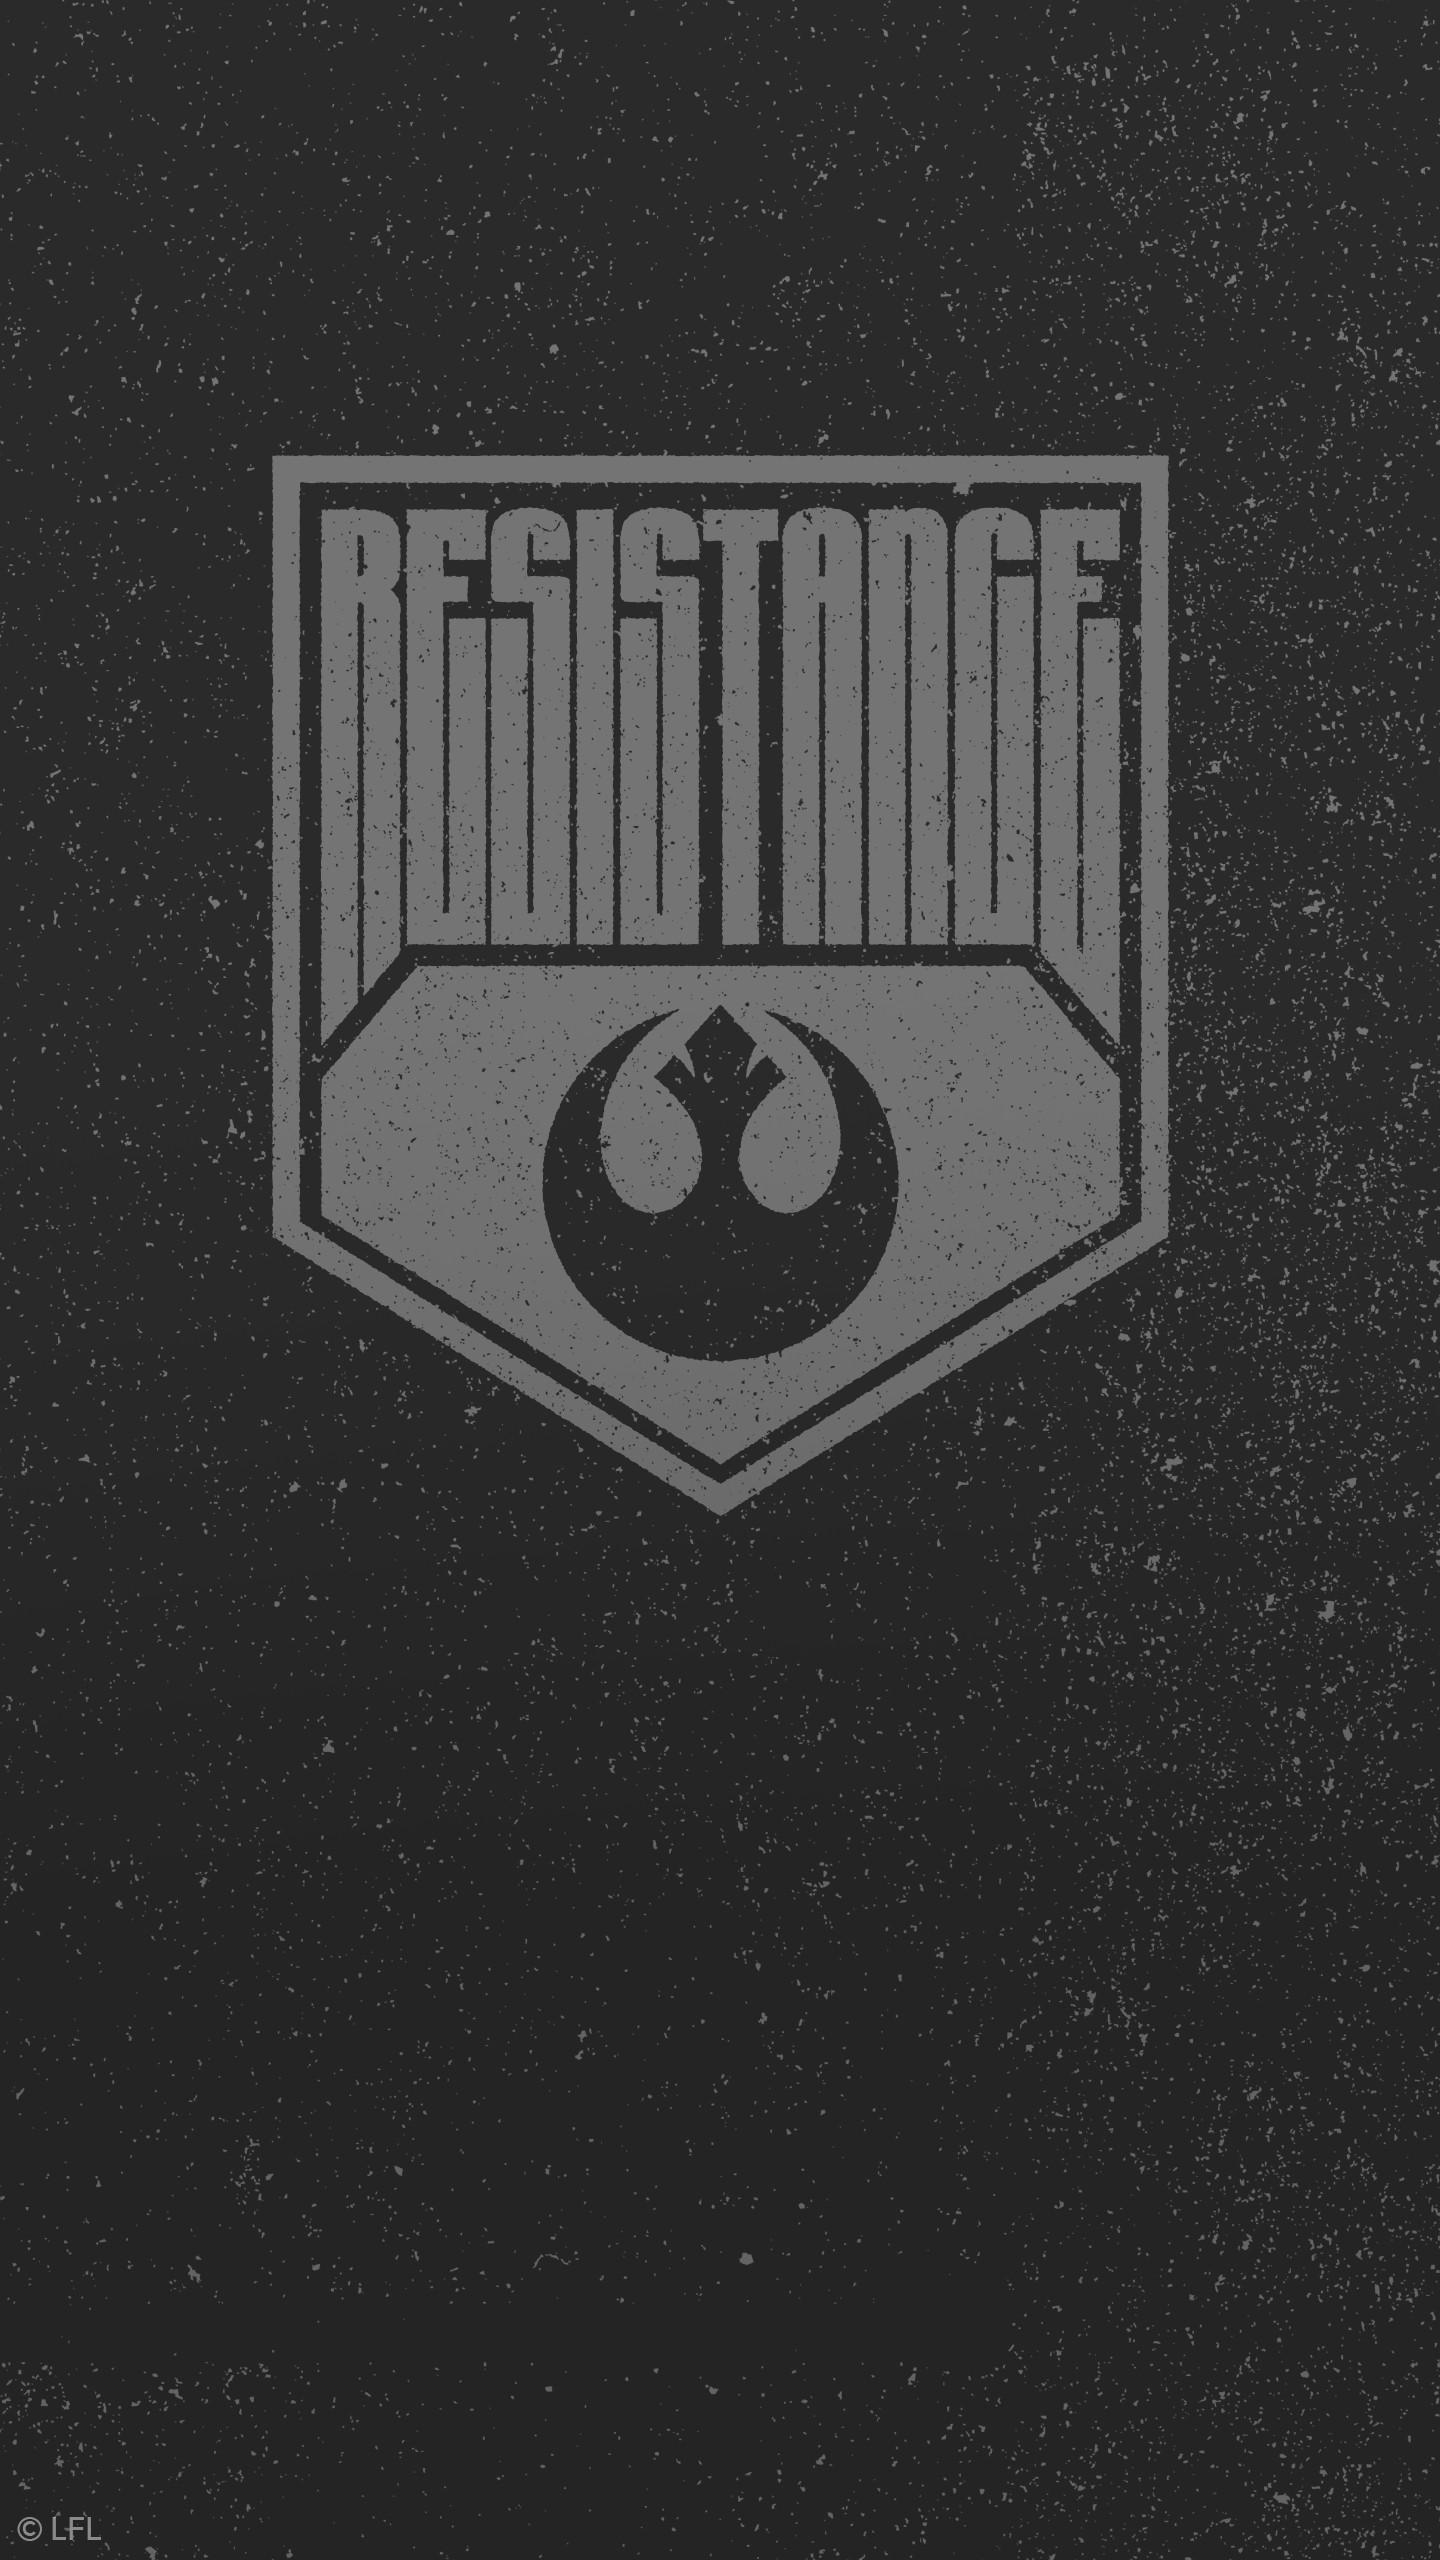 Star Wars: The Force Awakens Wallpaper